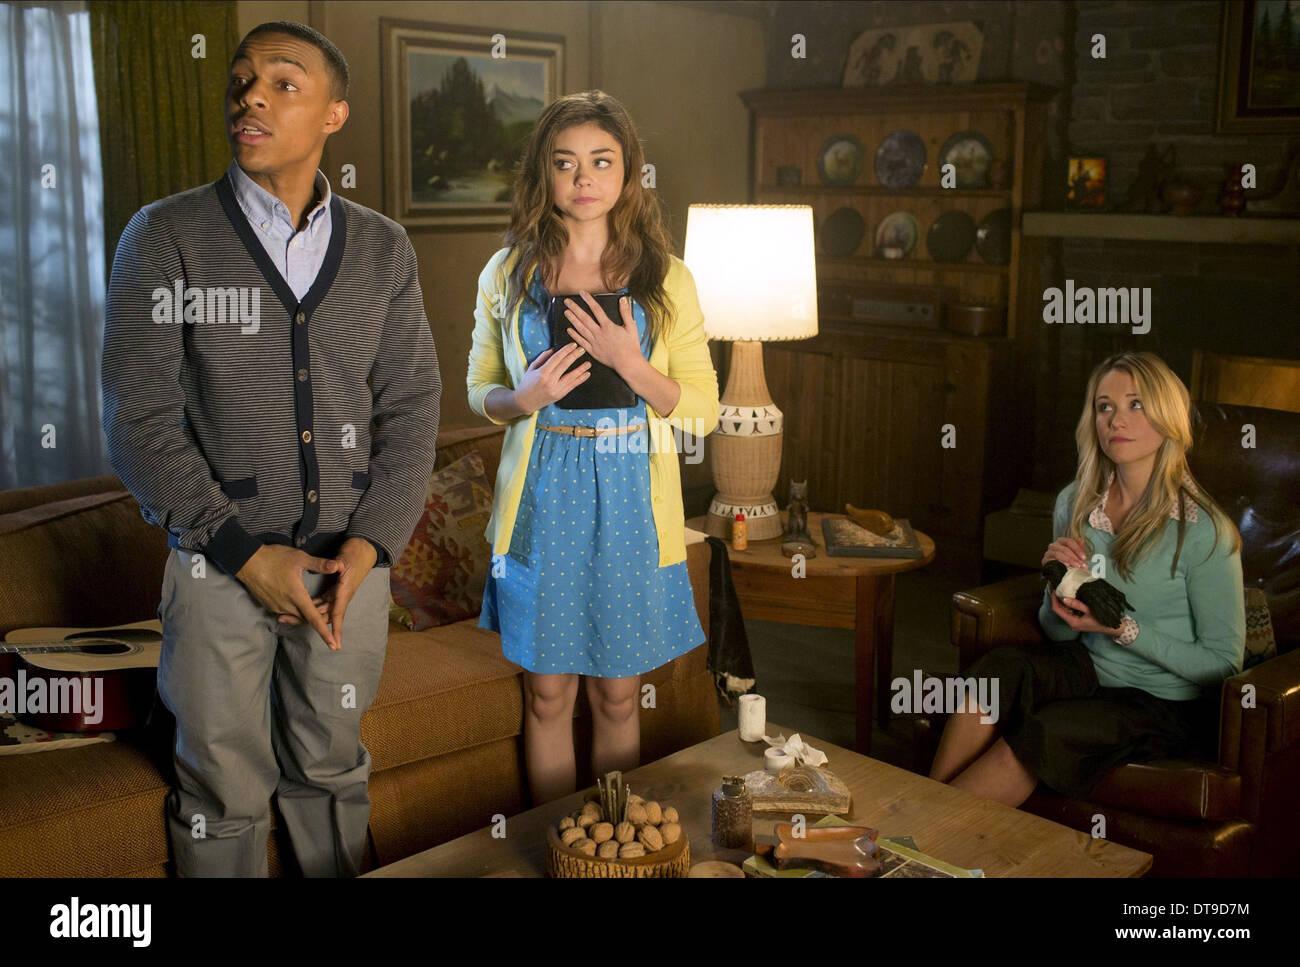 Bow Wow Sarah Hyland Katrina Bowden Scary Movie 5 2013 Fotografia De Stock Alamy